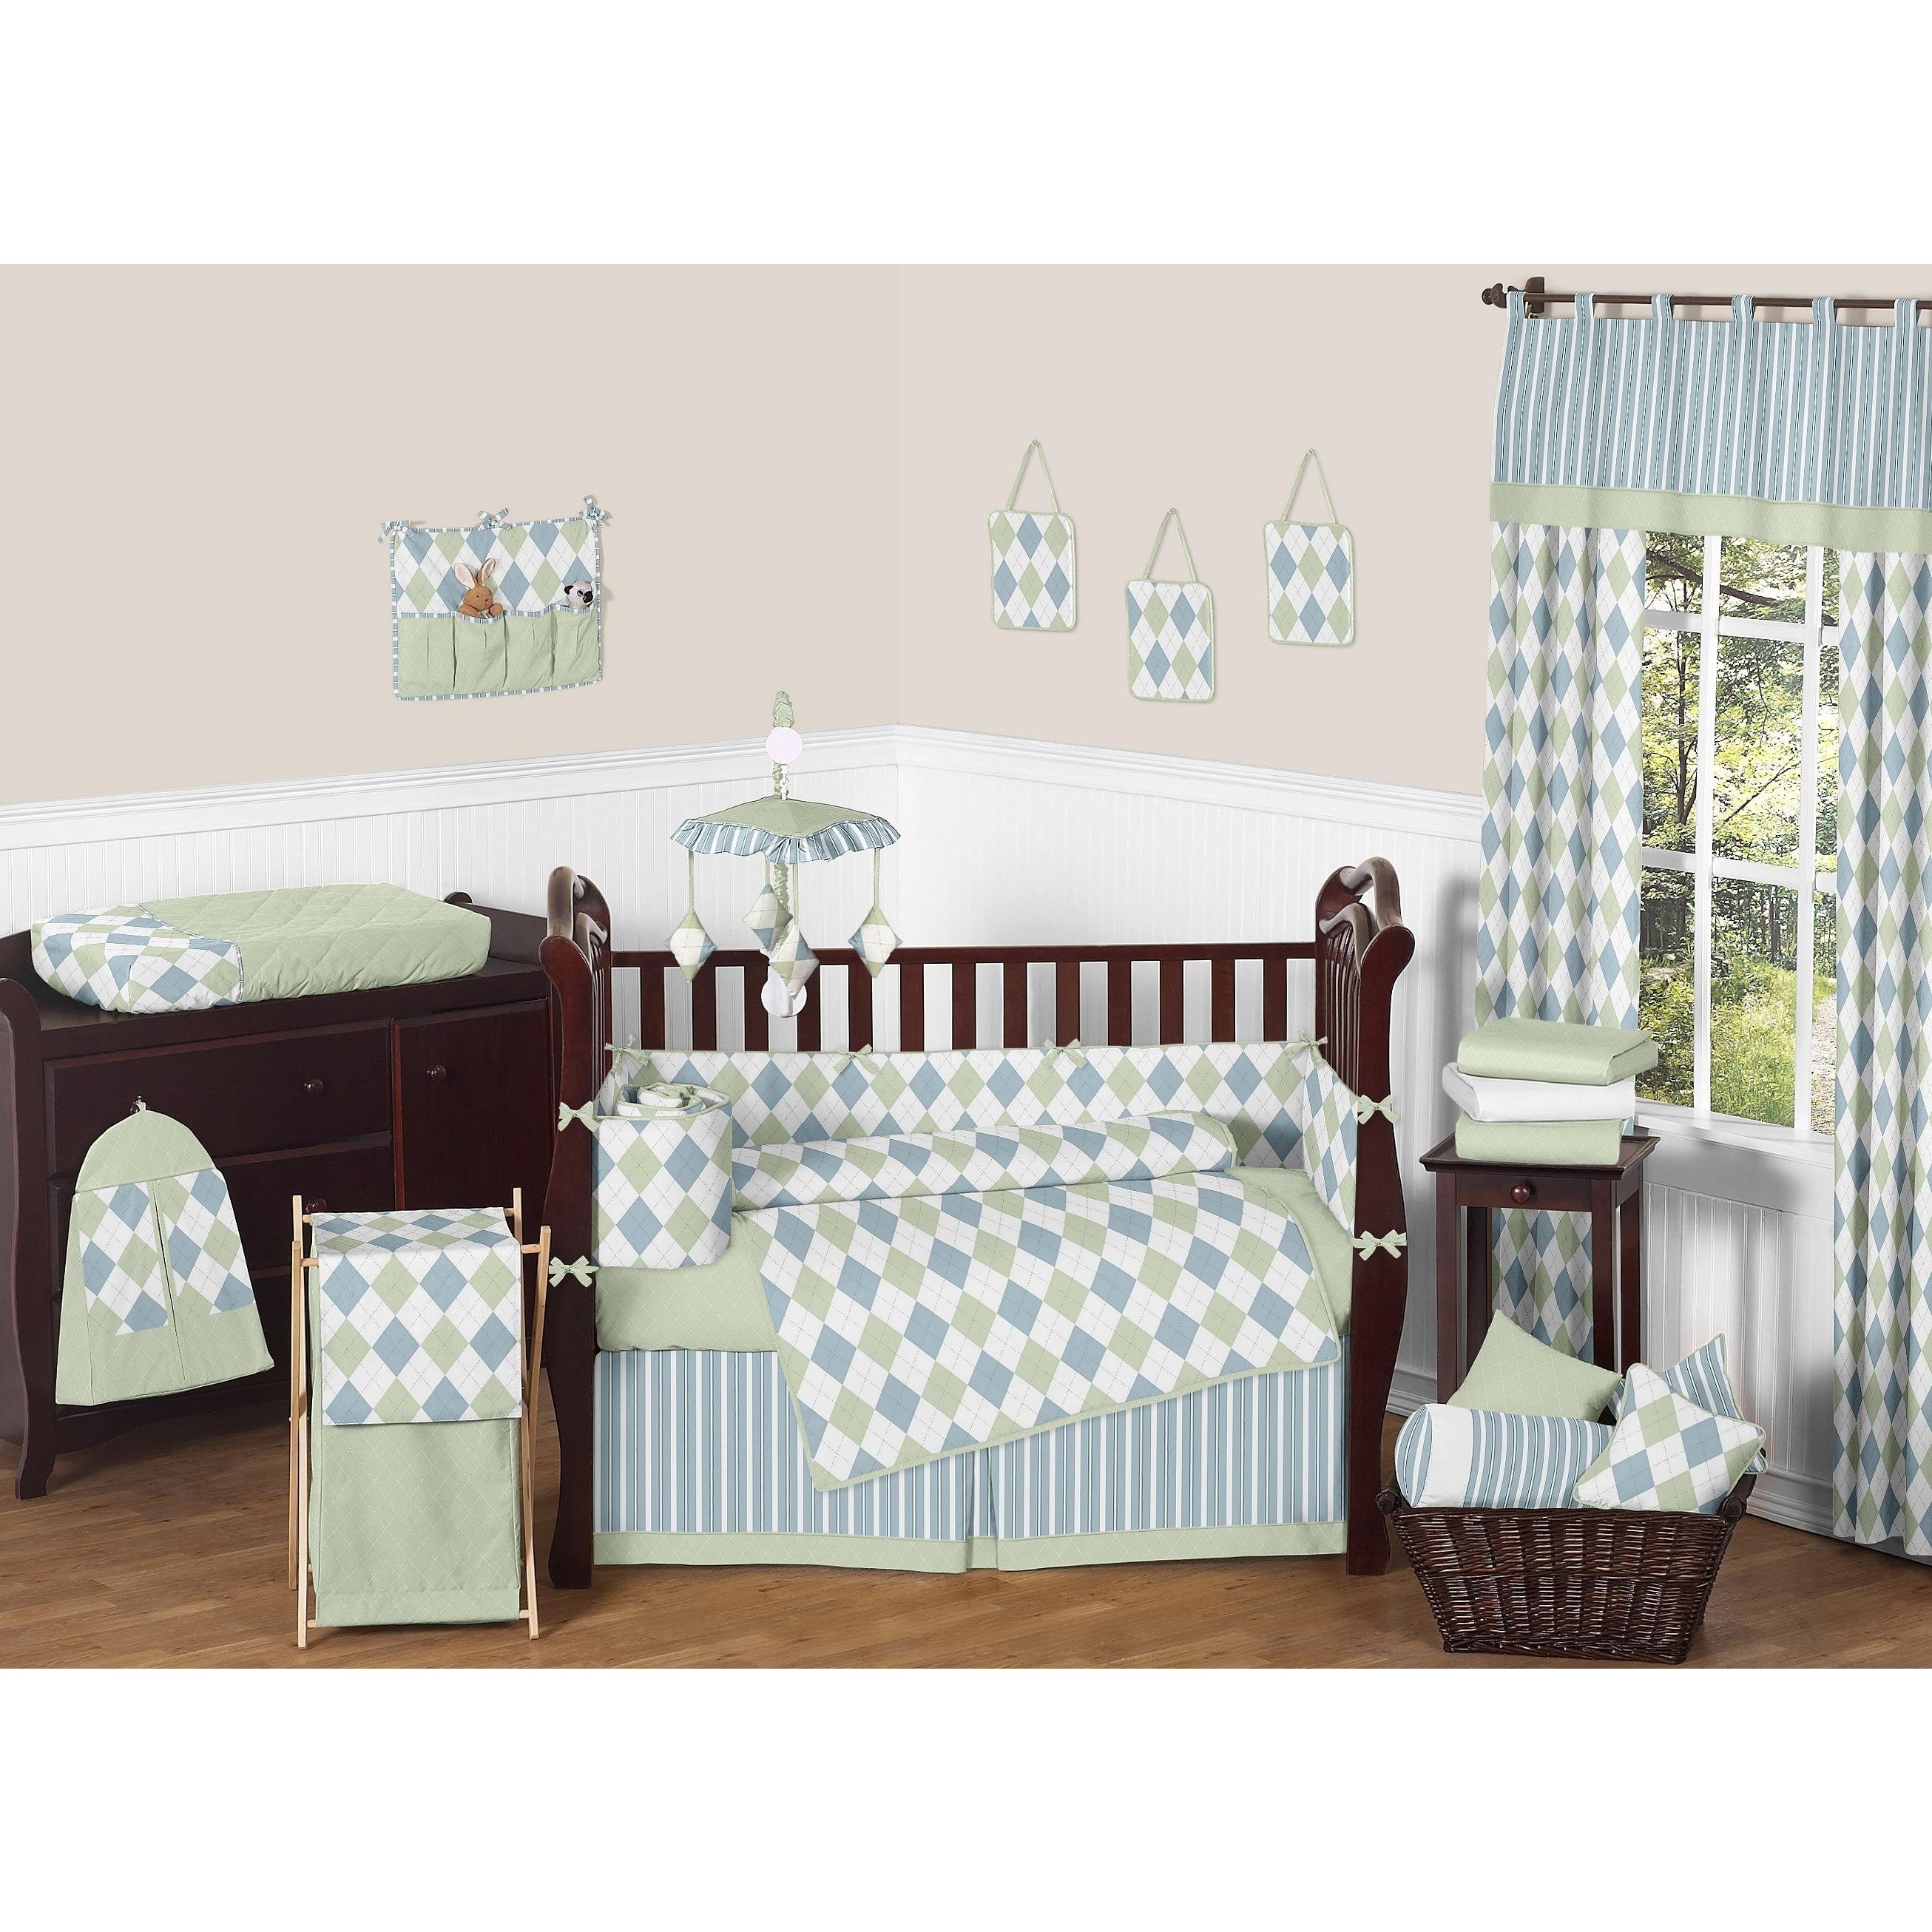 Sweet Jojo Designs Blue And Green Argyle 9 Piece Crib Bedding Set Free Shipping Today 5298423